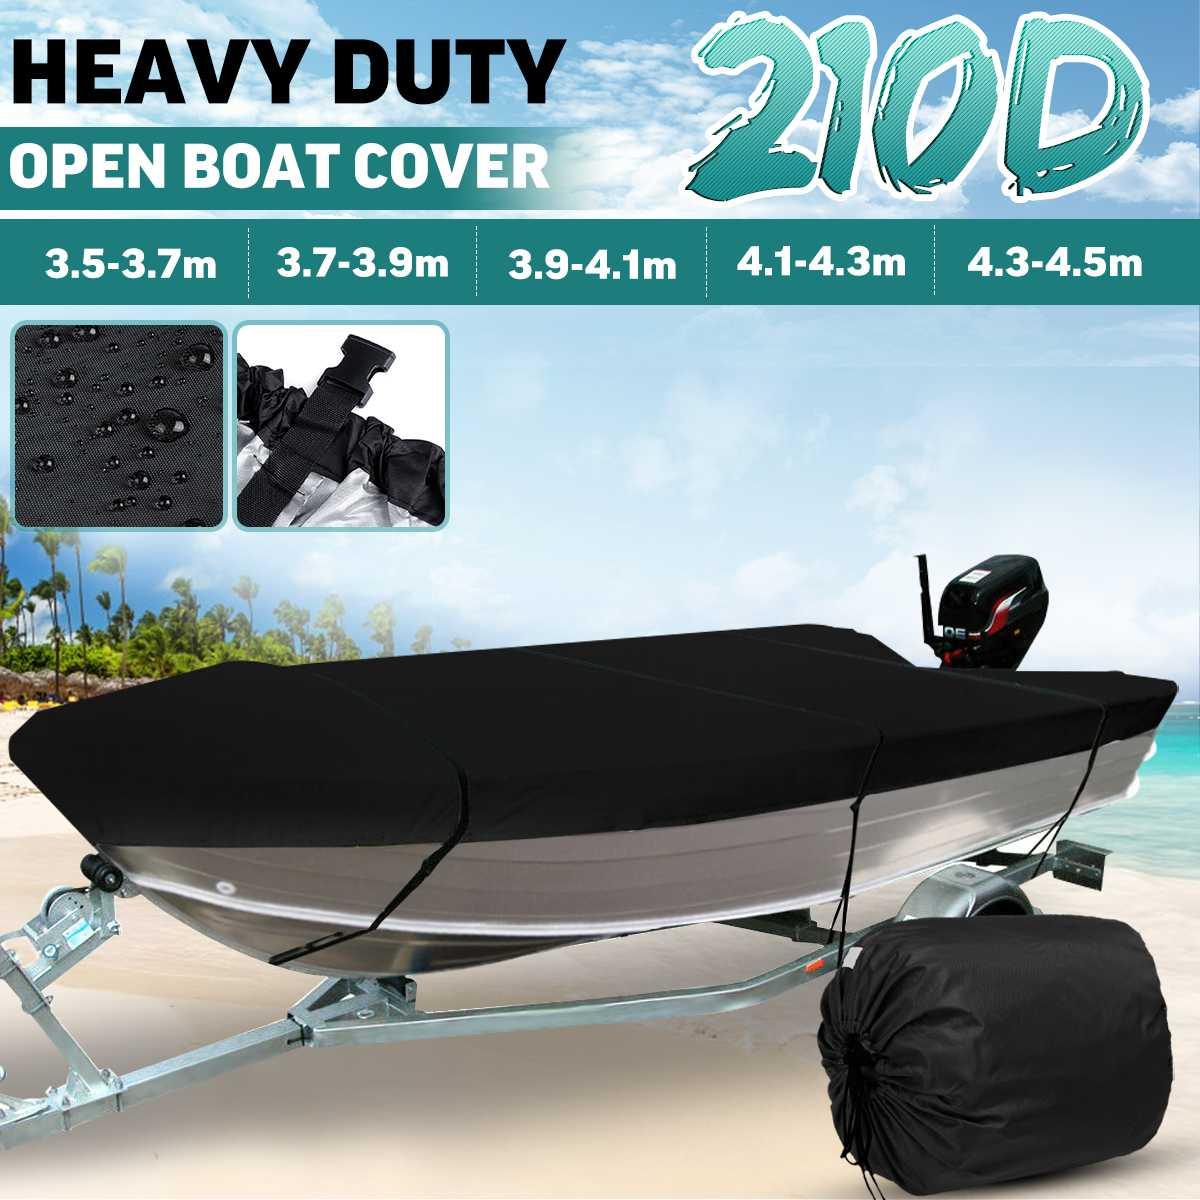 Tri-Hull Heavy Duty Universal Storage kemimoto Jet Ski Boat Cover for SEA DOO JS 139x48 V-Hull,Fish/&Ski Pro-Style Runabout Bass Boat Fishing Boat